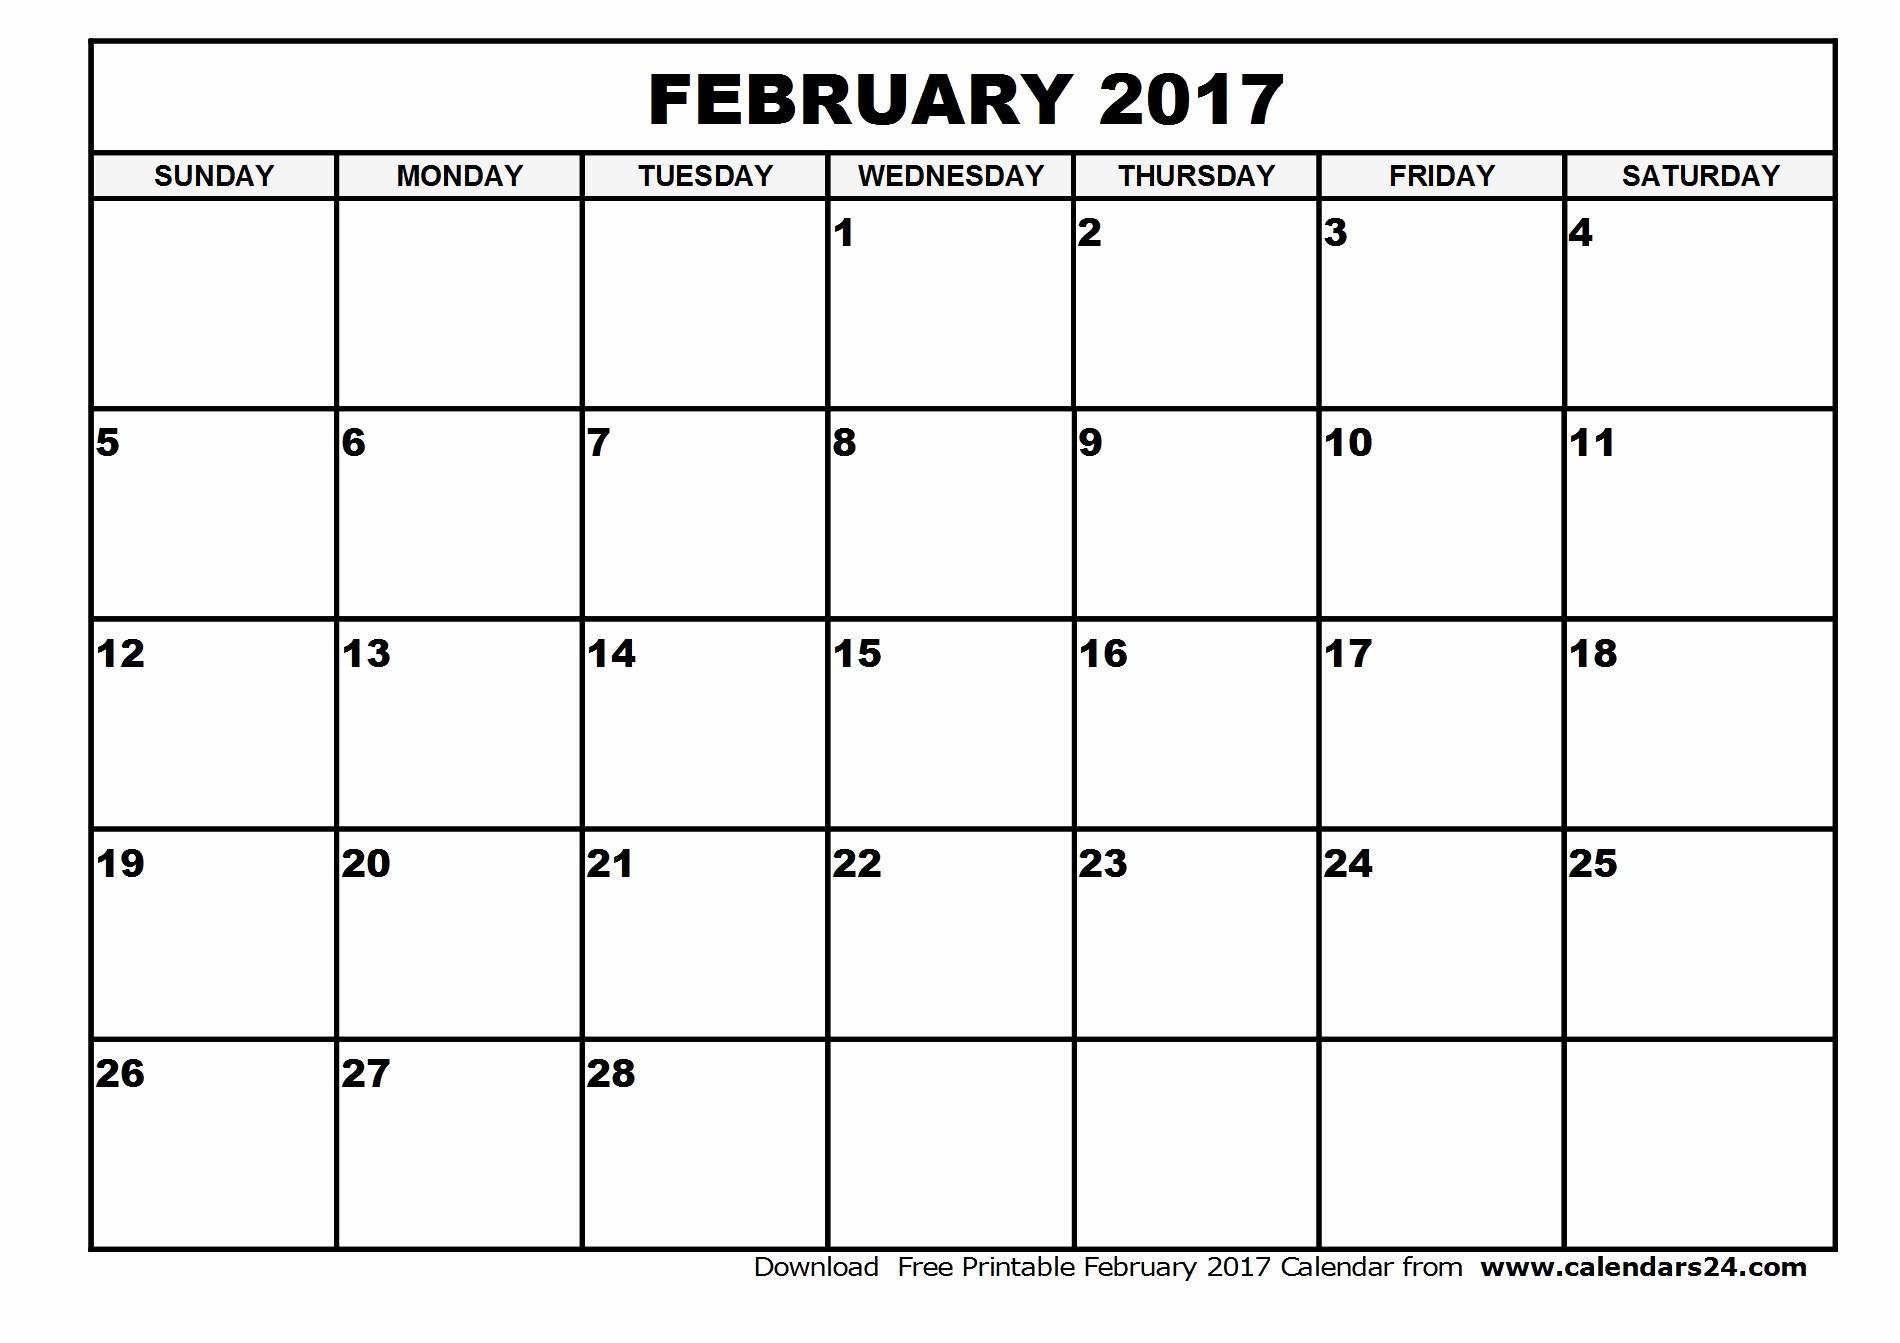 2017 Calendar Template Word Document Awesome February 2017 Calendar Word